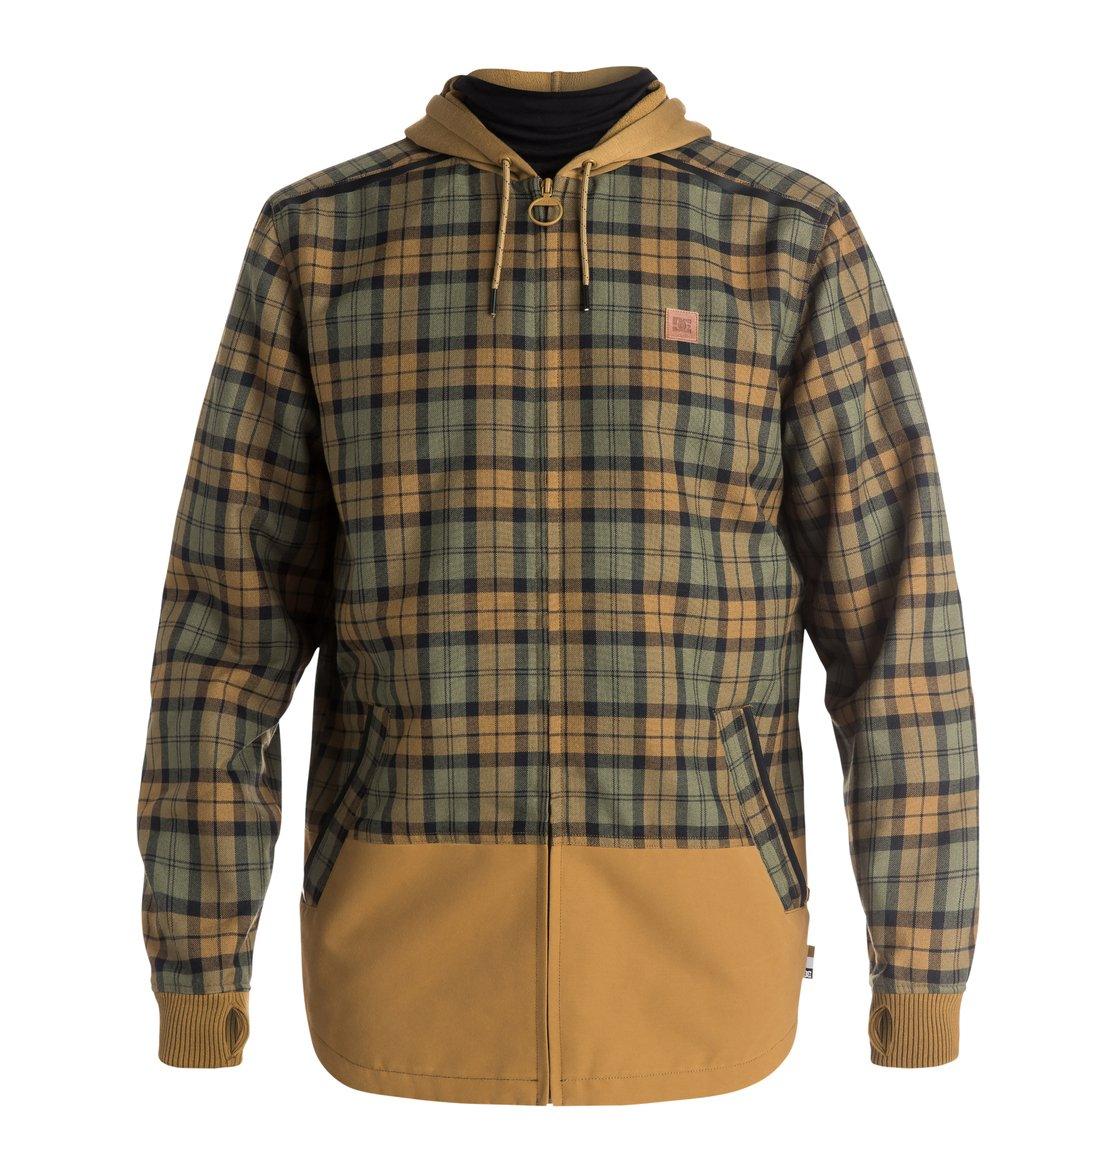 Катальная рубашка Backwoods Flannel от DC Shoes